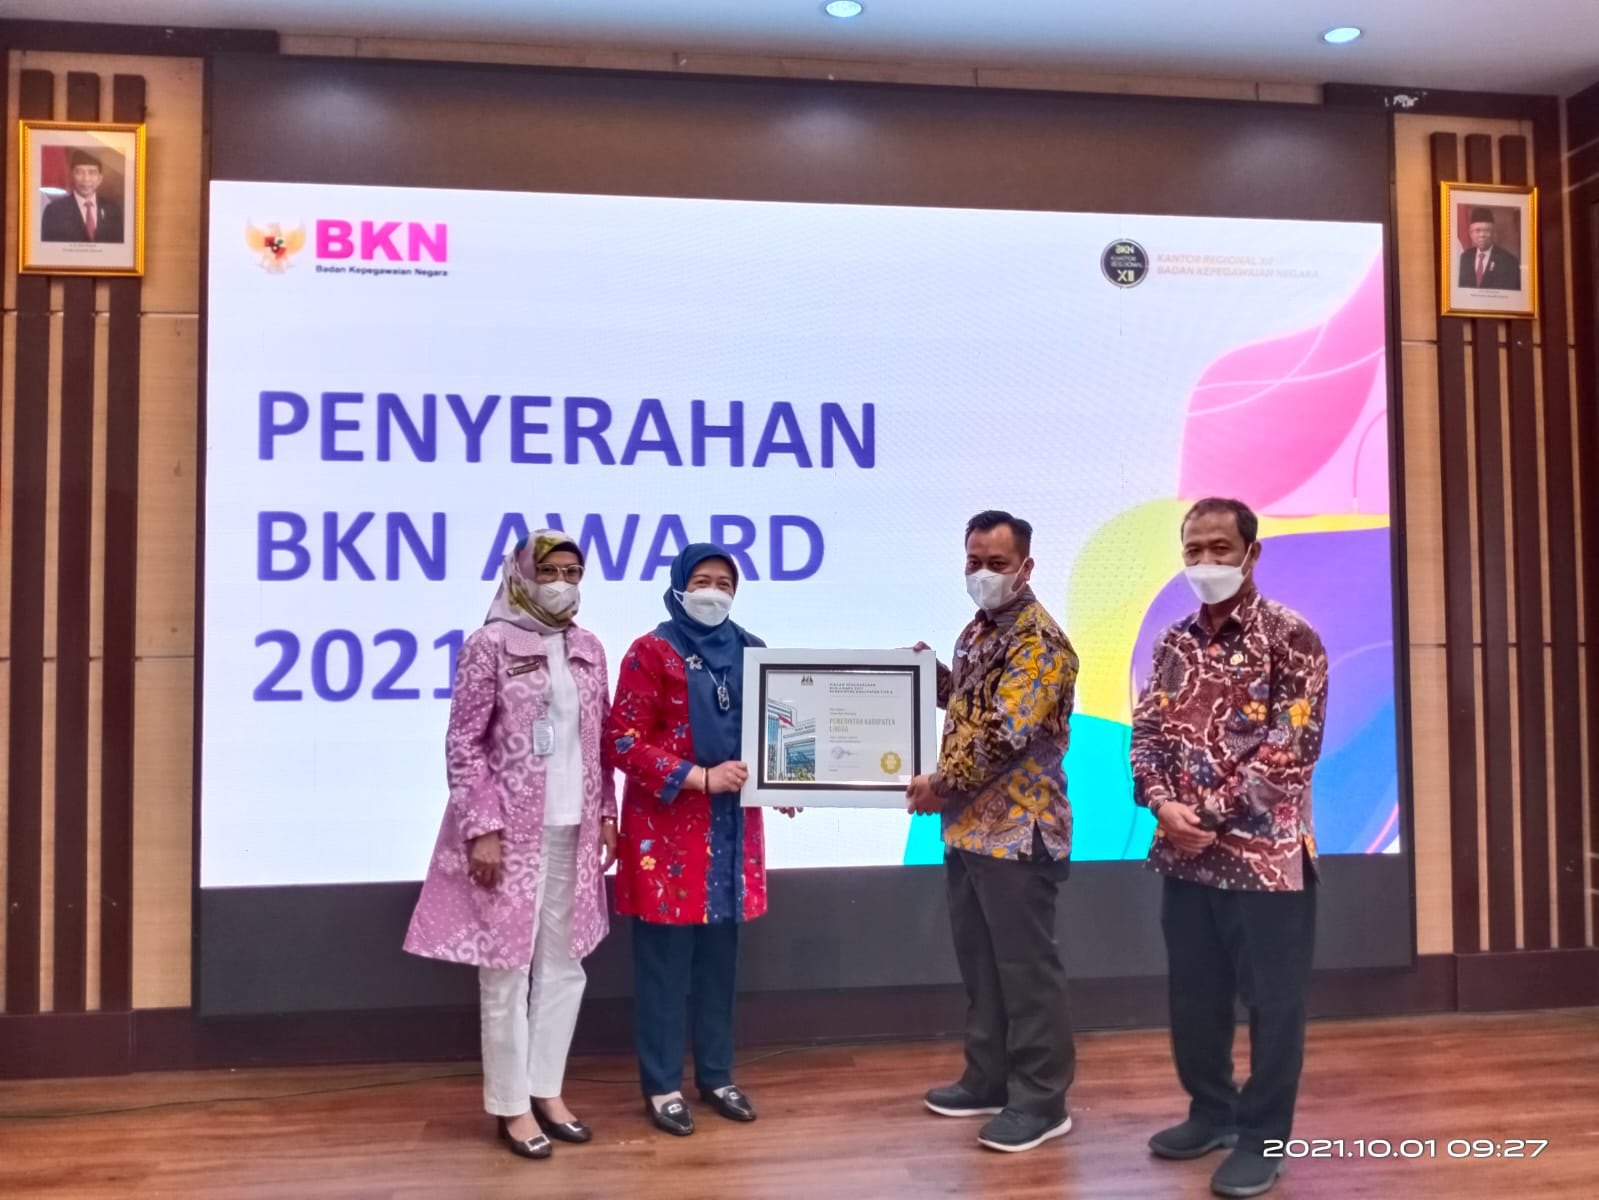 Bupati Lingga, M. Nizar Saat Menerima Penghargaan BKN Award Dari BKN RI